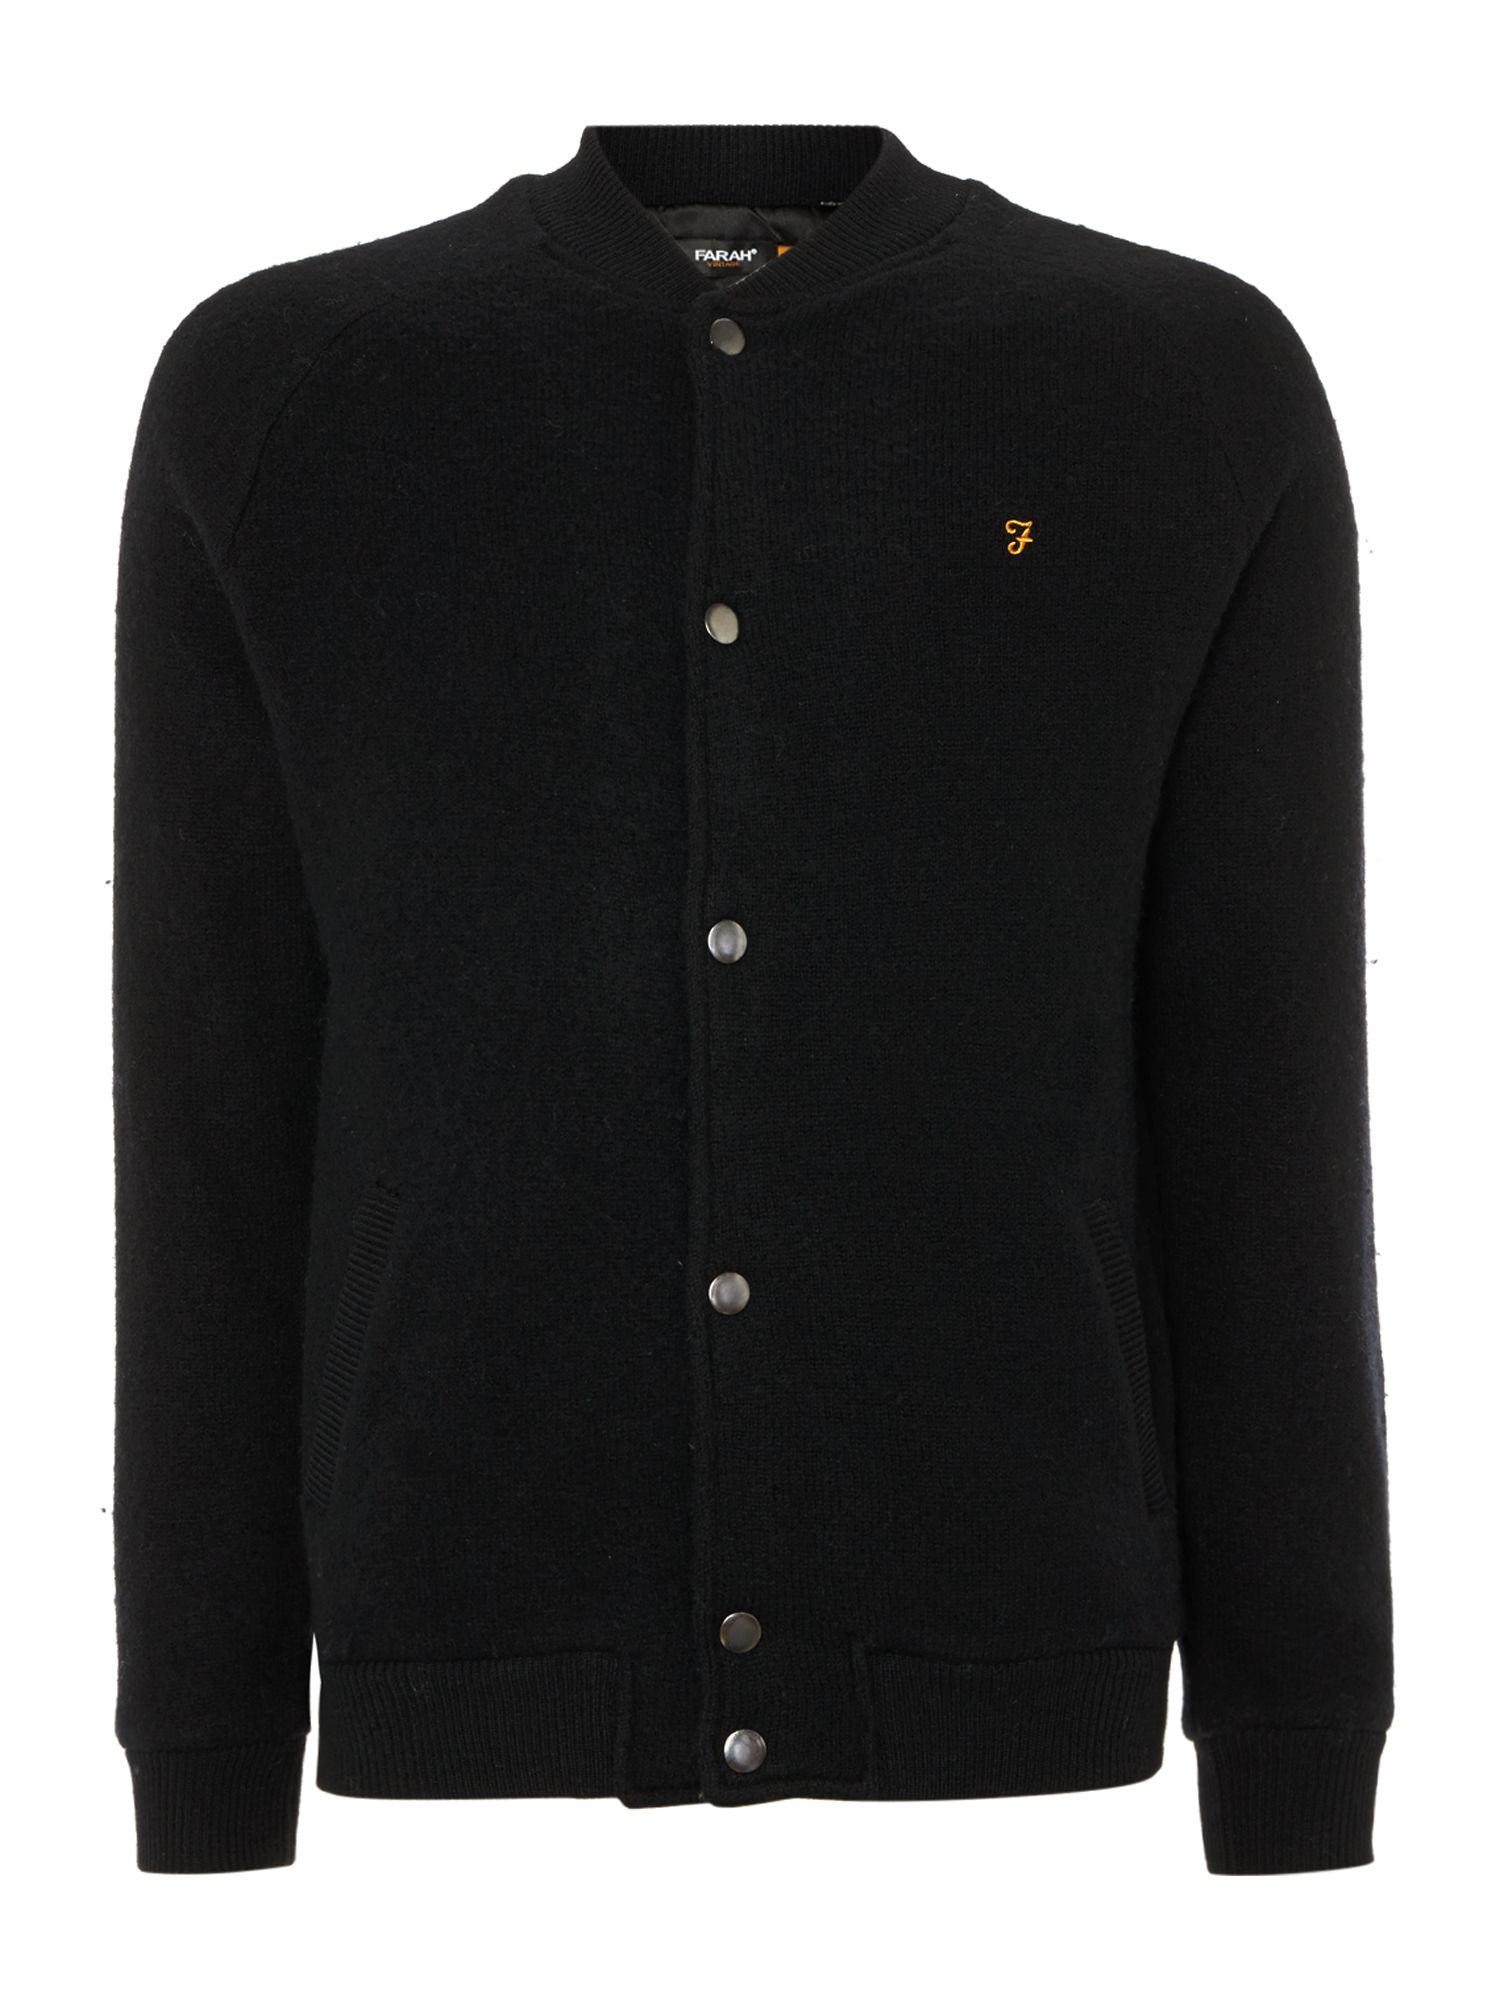 Farah Wool Bomber Jacket In Black For Men Lyst